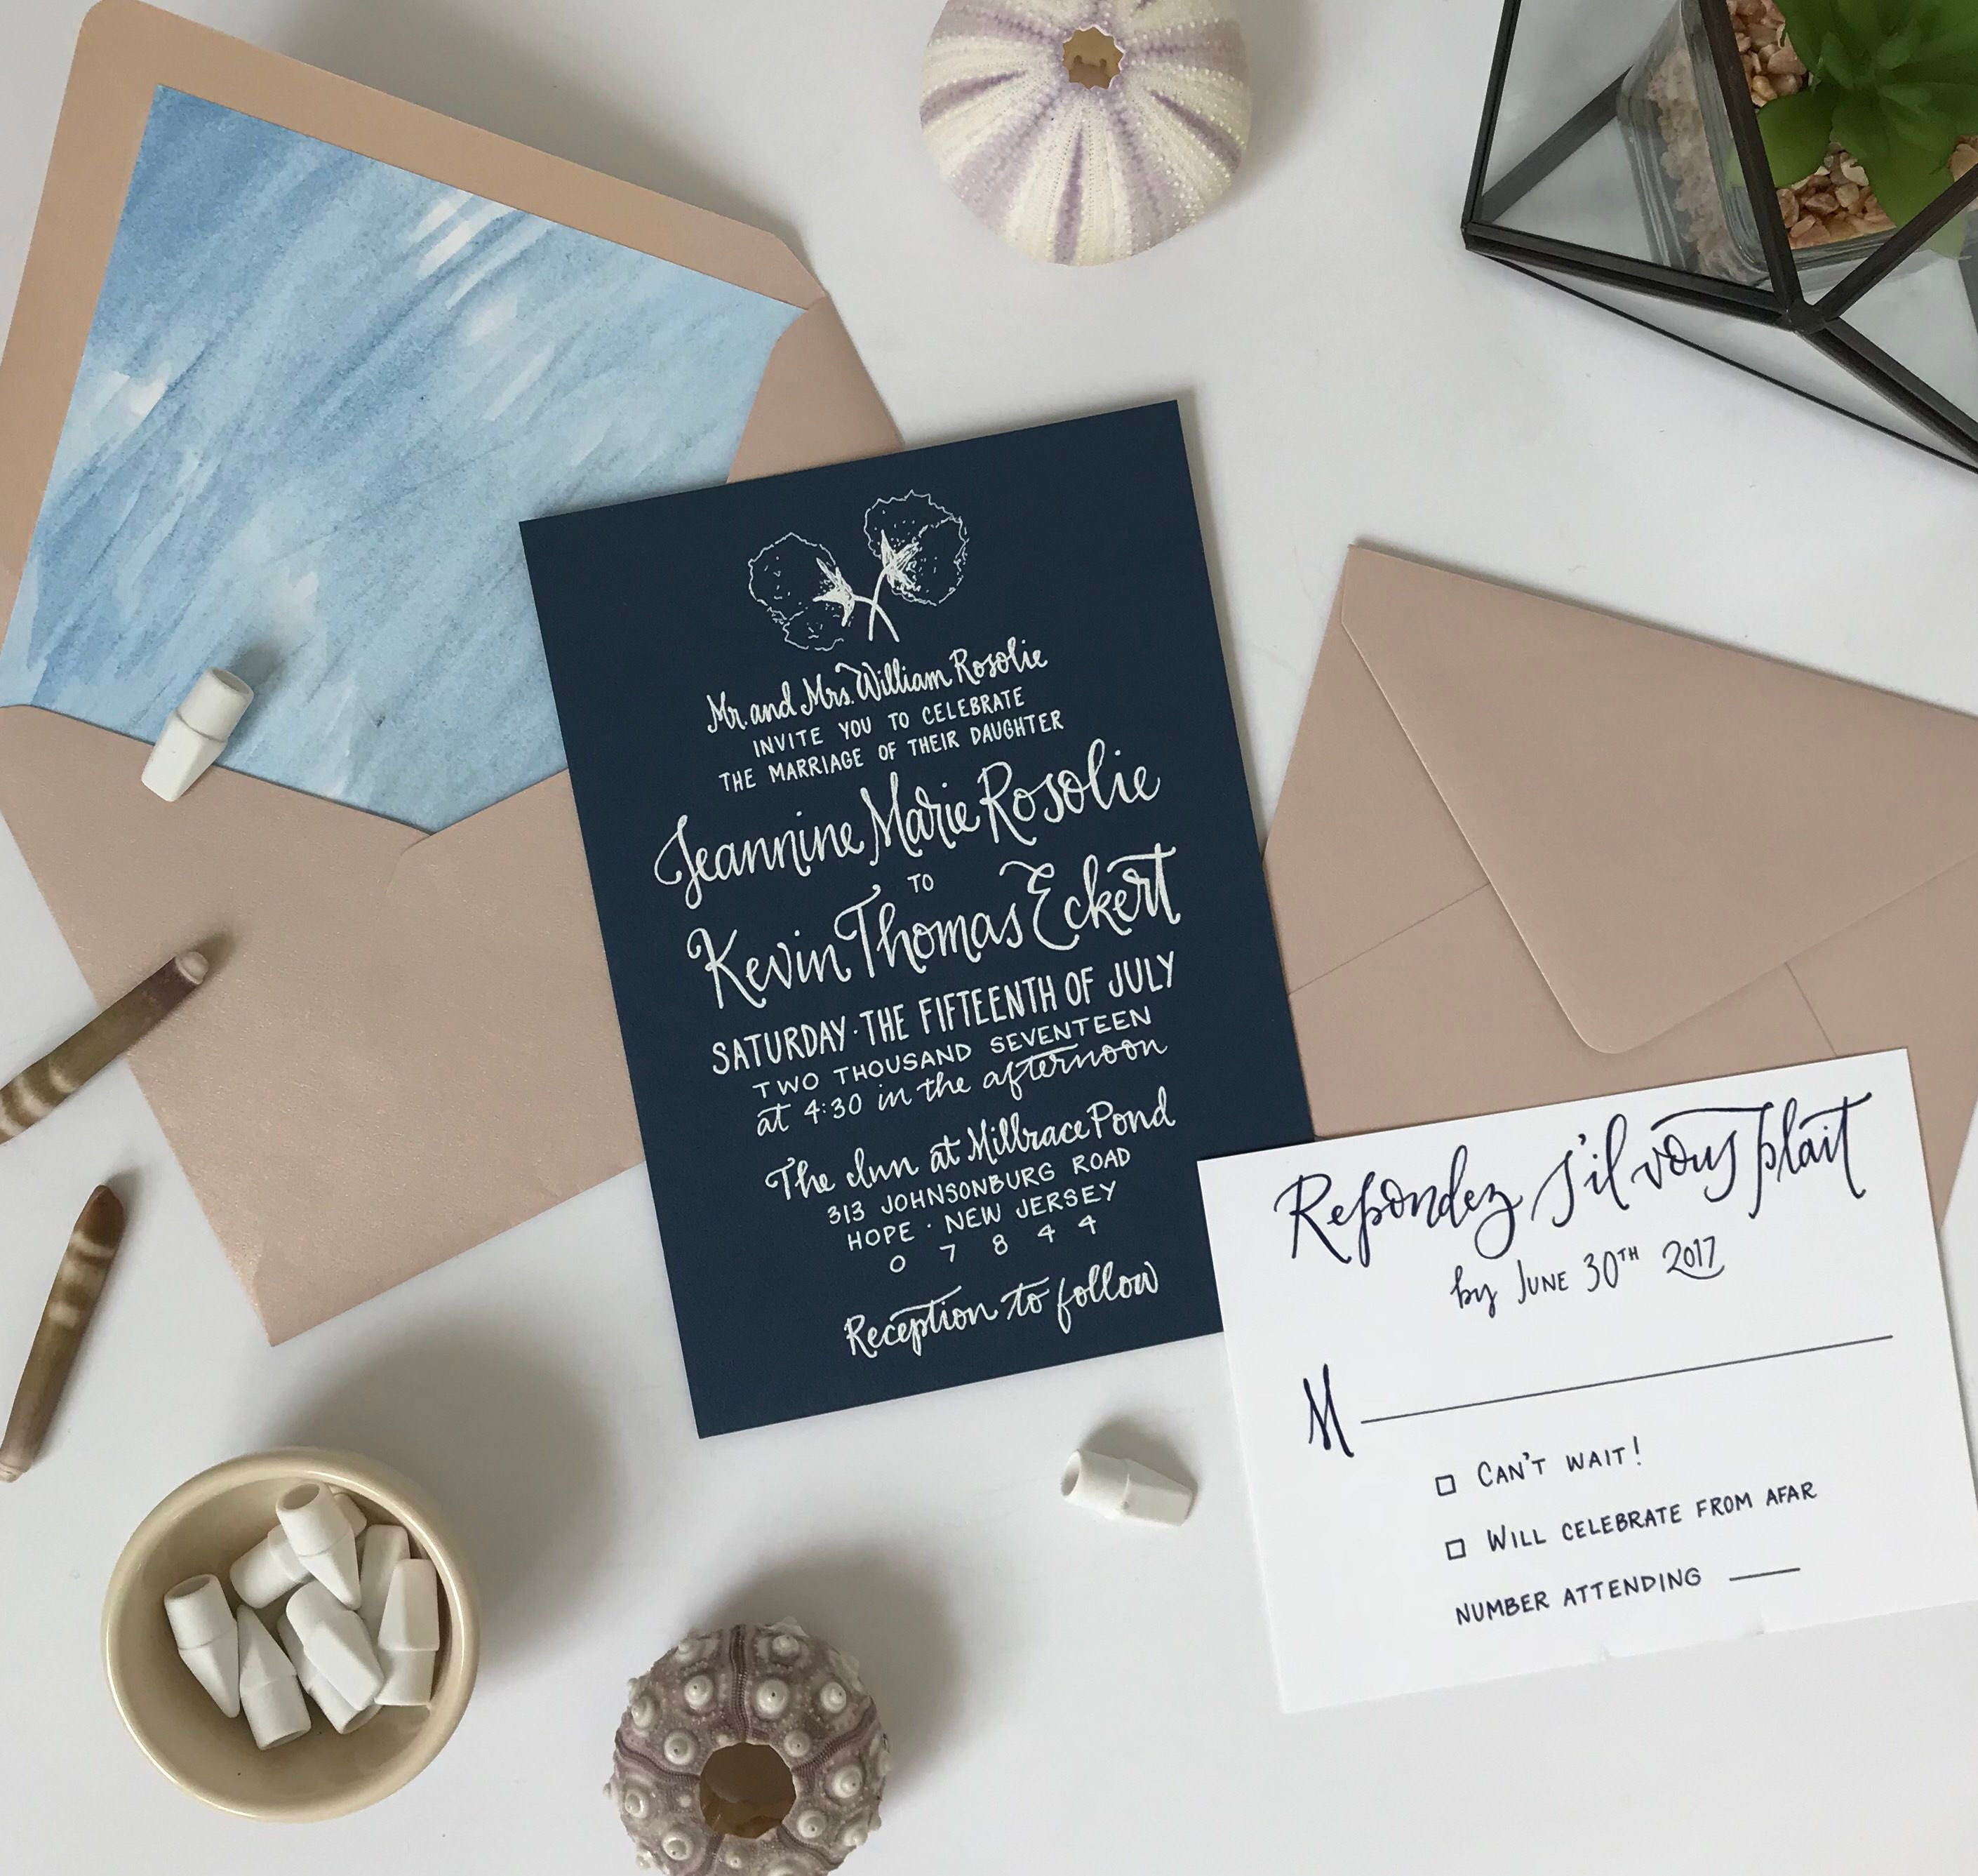 outdoor wedding invitations rose gold wedding invites navy wedding invites southern wedding invitations cotton wedding invites - Outdoor Wedding Invitations